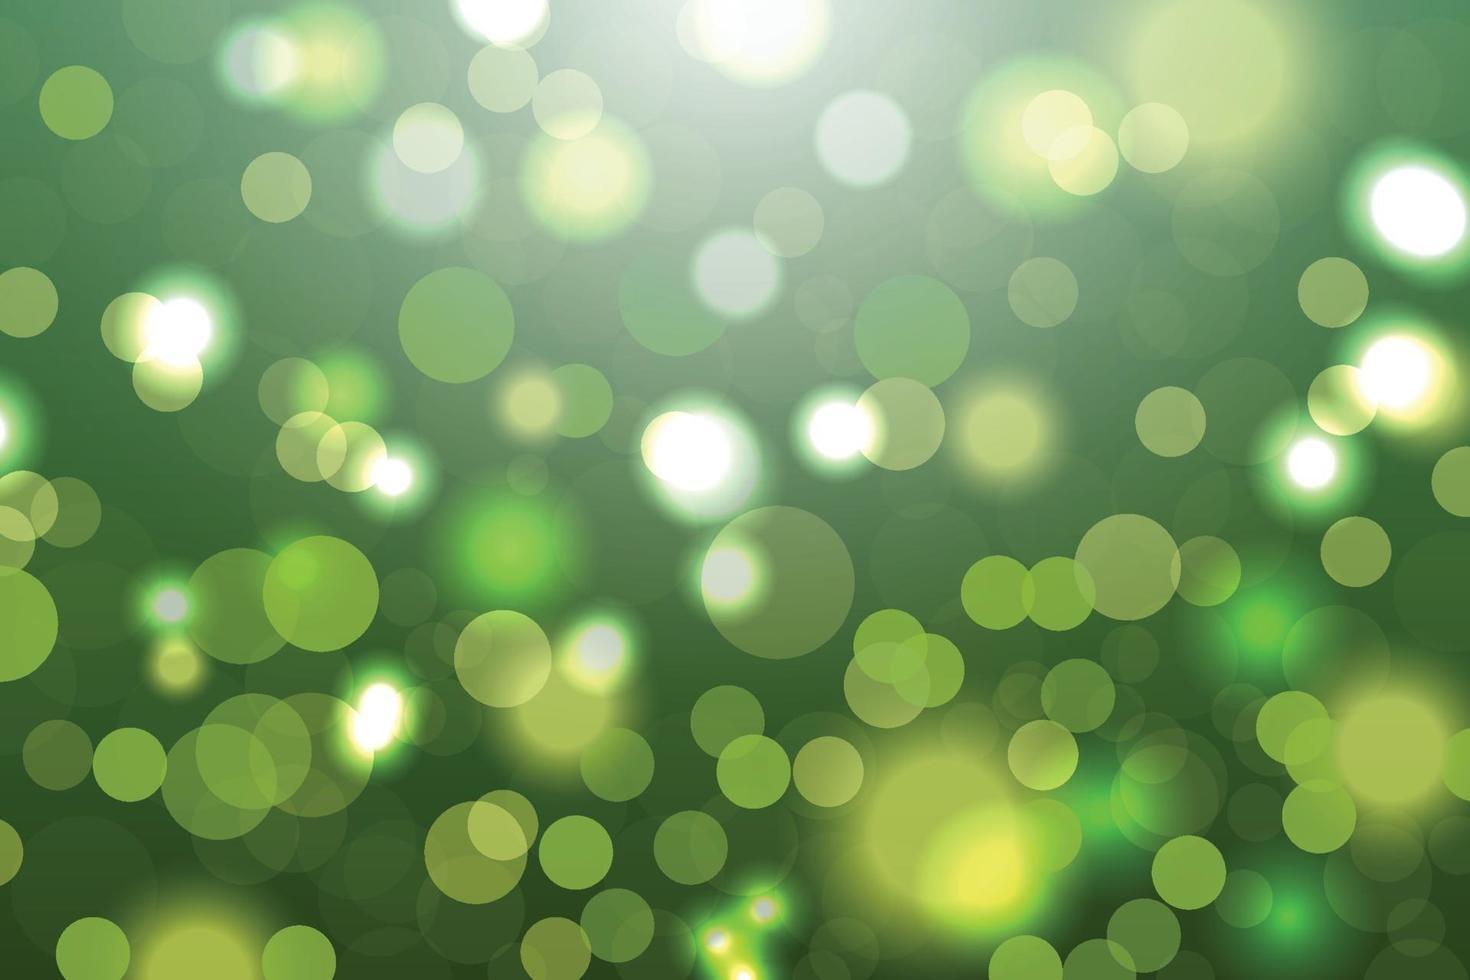 Illustration des grünen Bokeh abstrakten Hintergrunds vektor